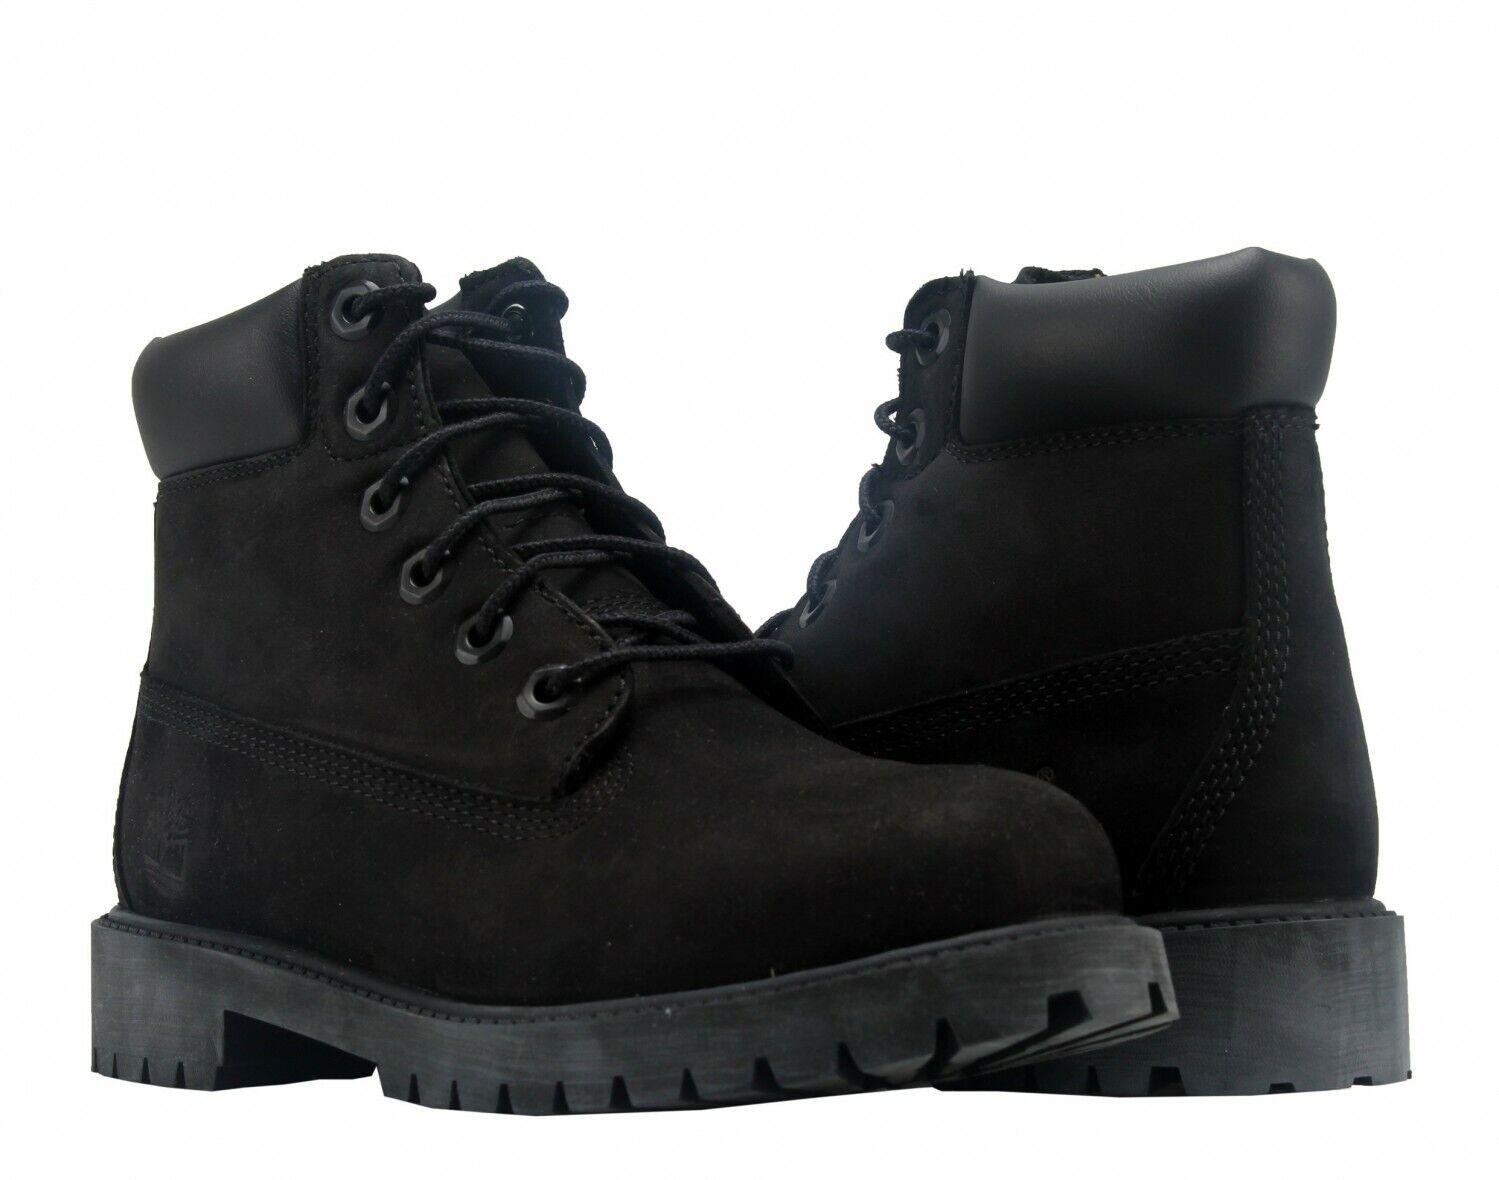 6 premium waterproof leather black boots 12907